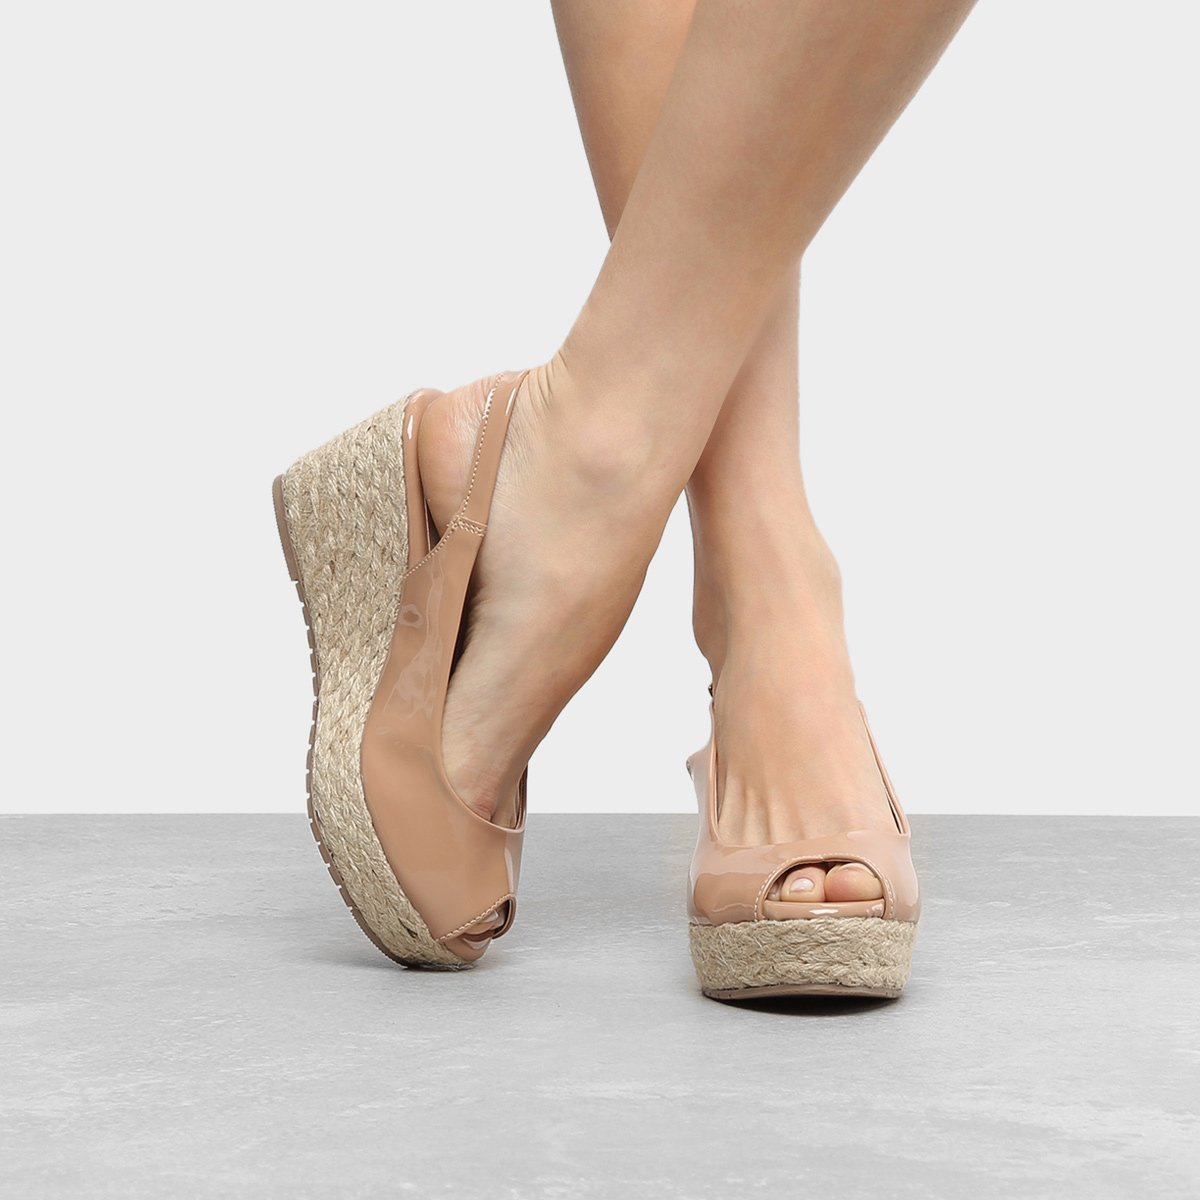 c69ec19c850f0 Sandália Anabela Shoestock Verniz Feminina | Shoestock